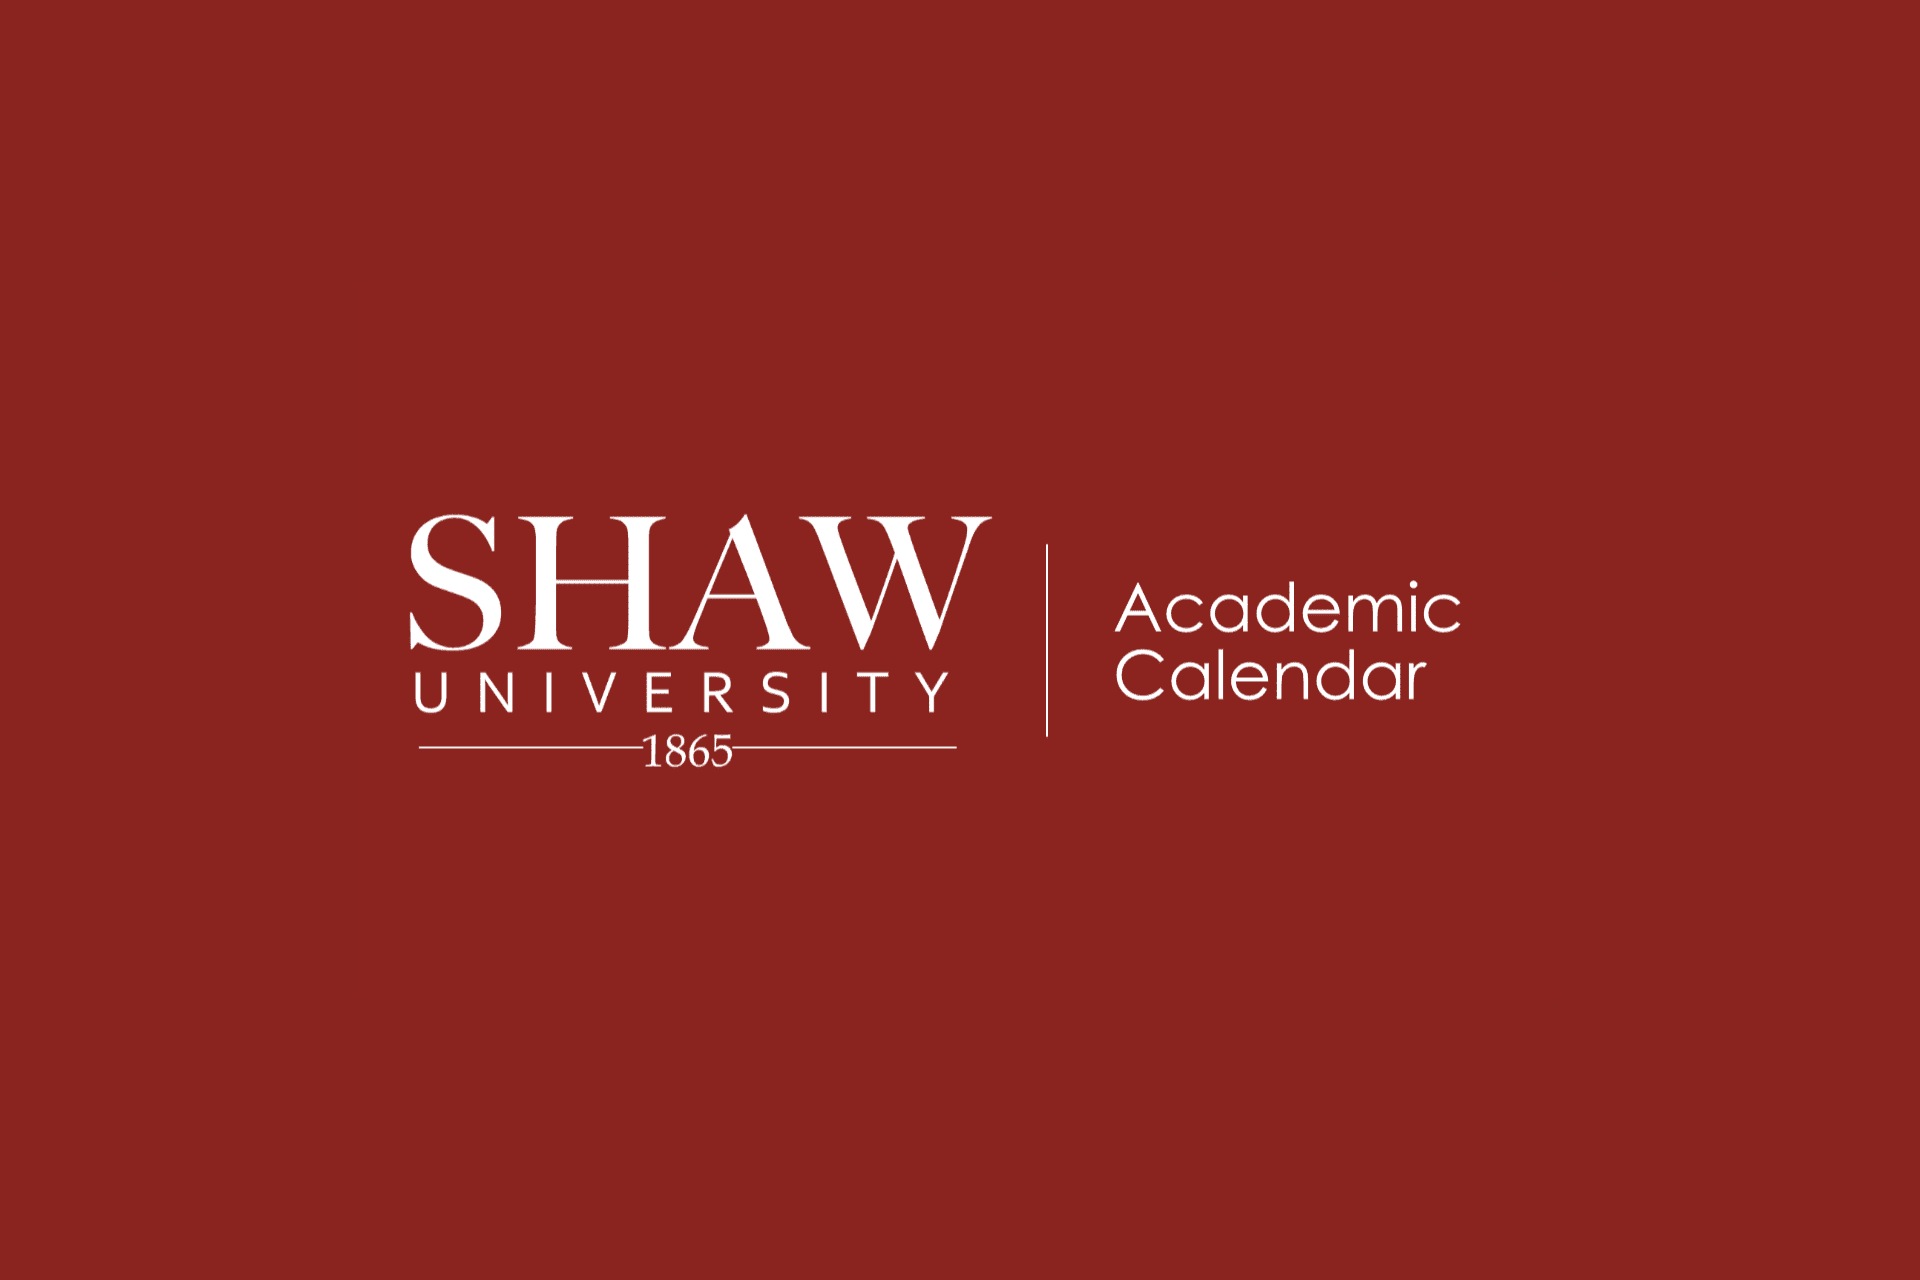 ShawU-logo-academic-calendar